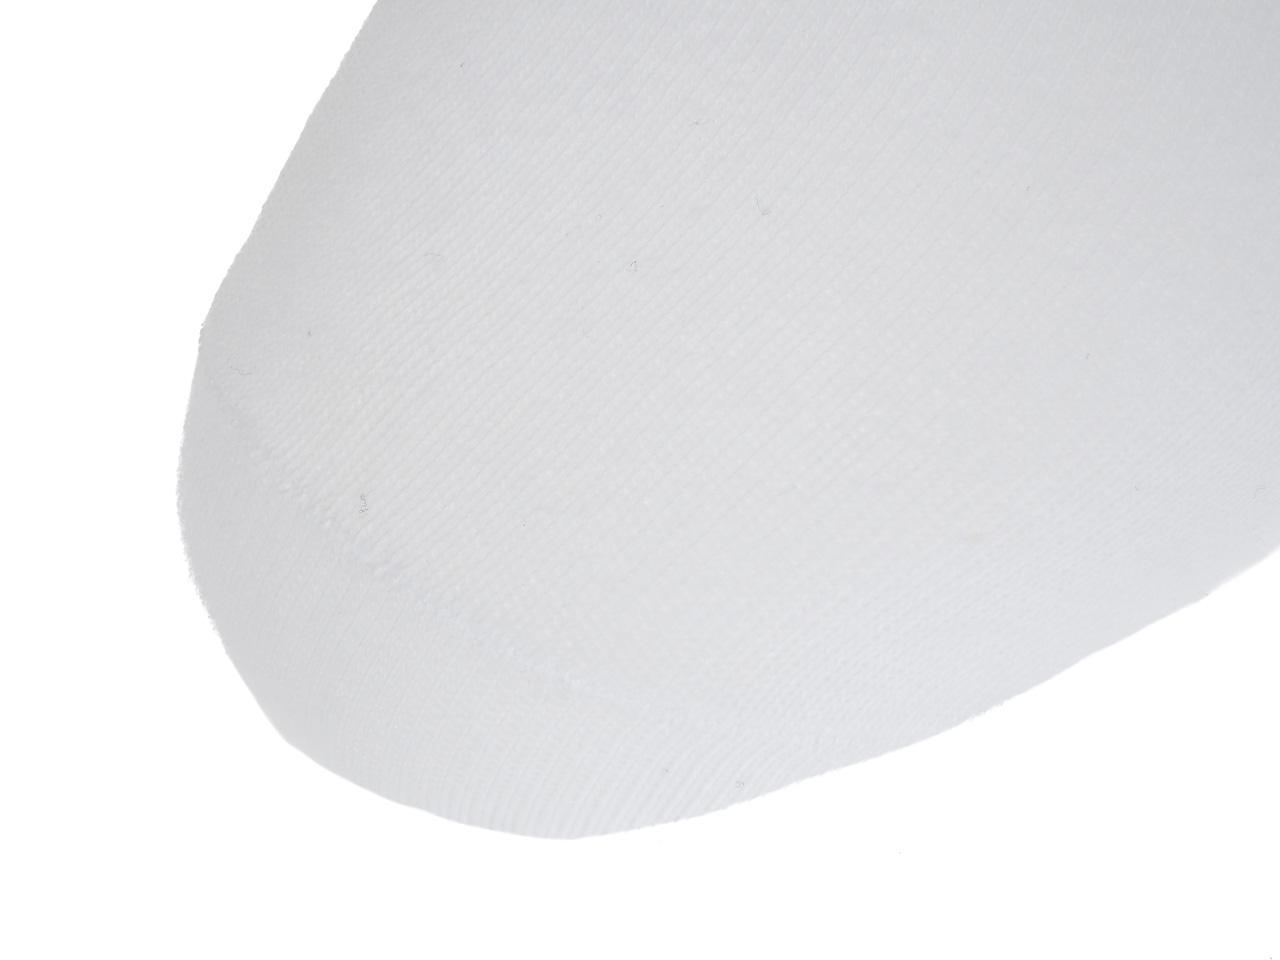 Socks-Invisible-Fila-Logo-White-Invis-par3-White-43060-New thumbnail 4